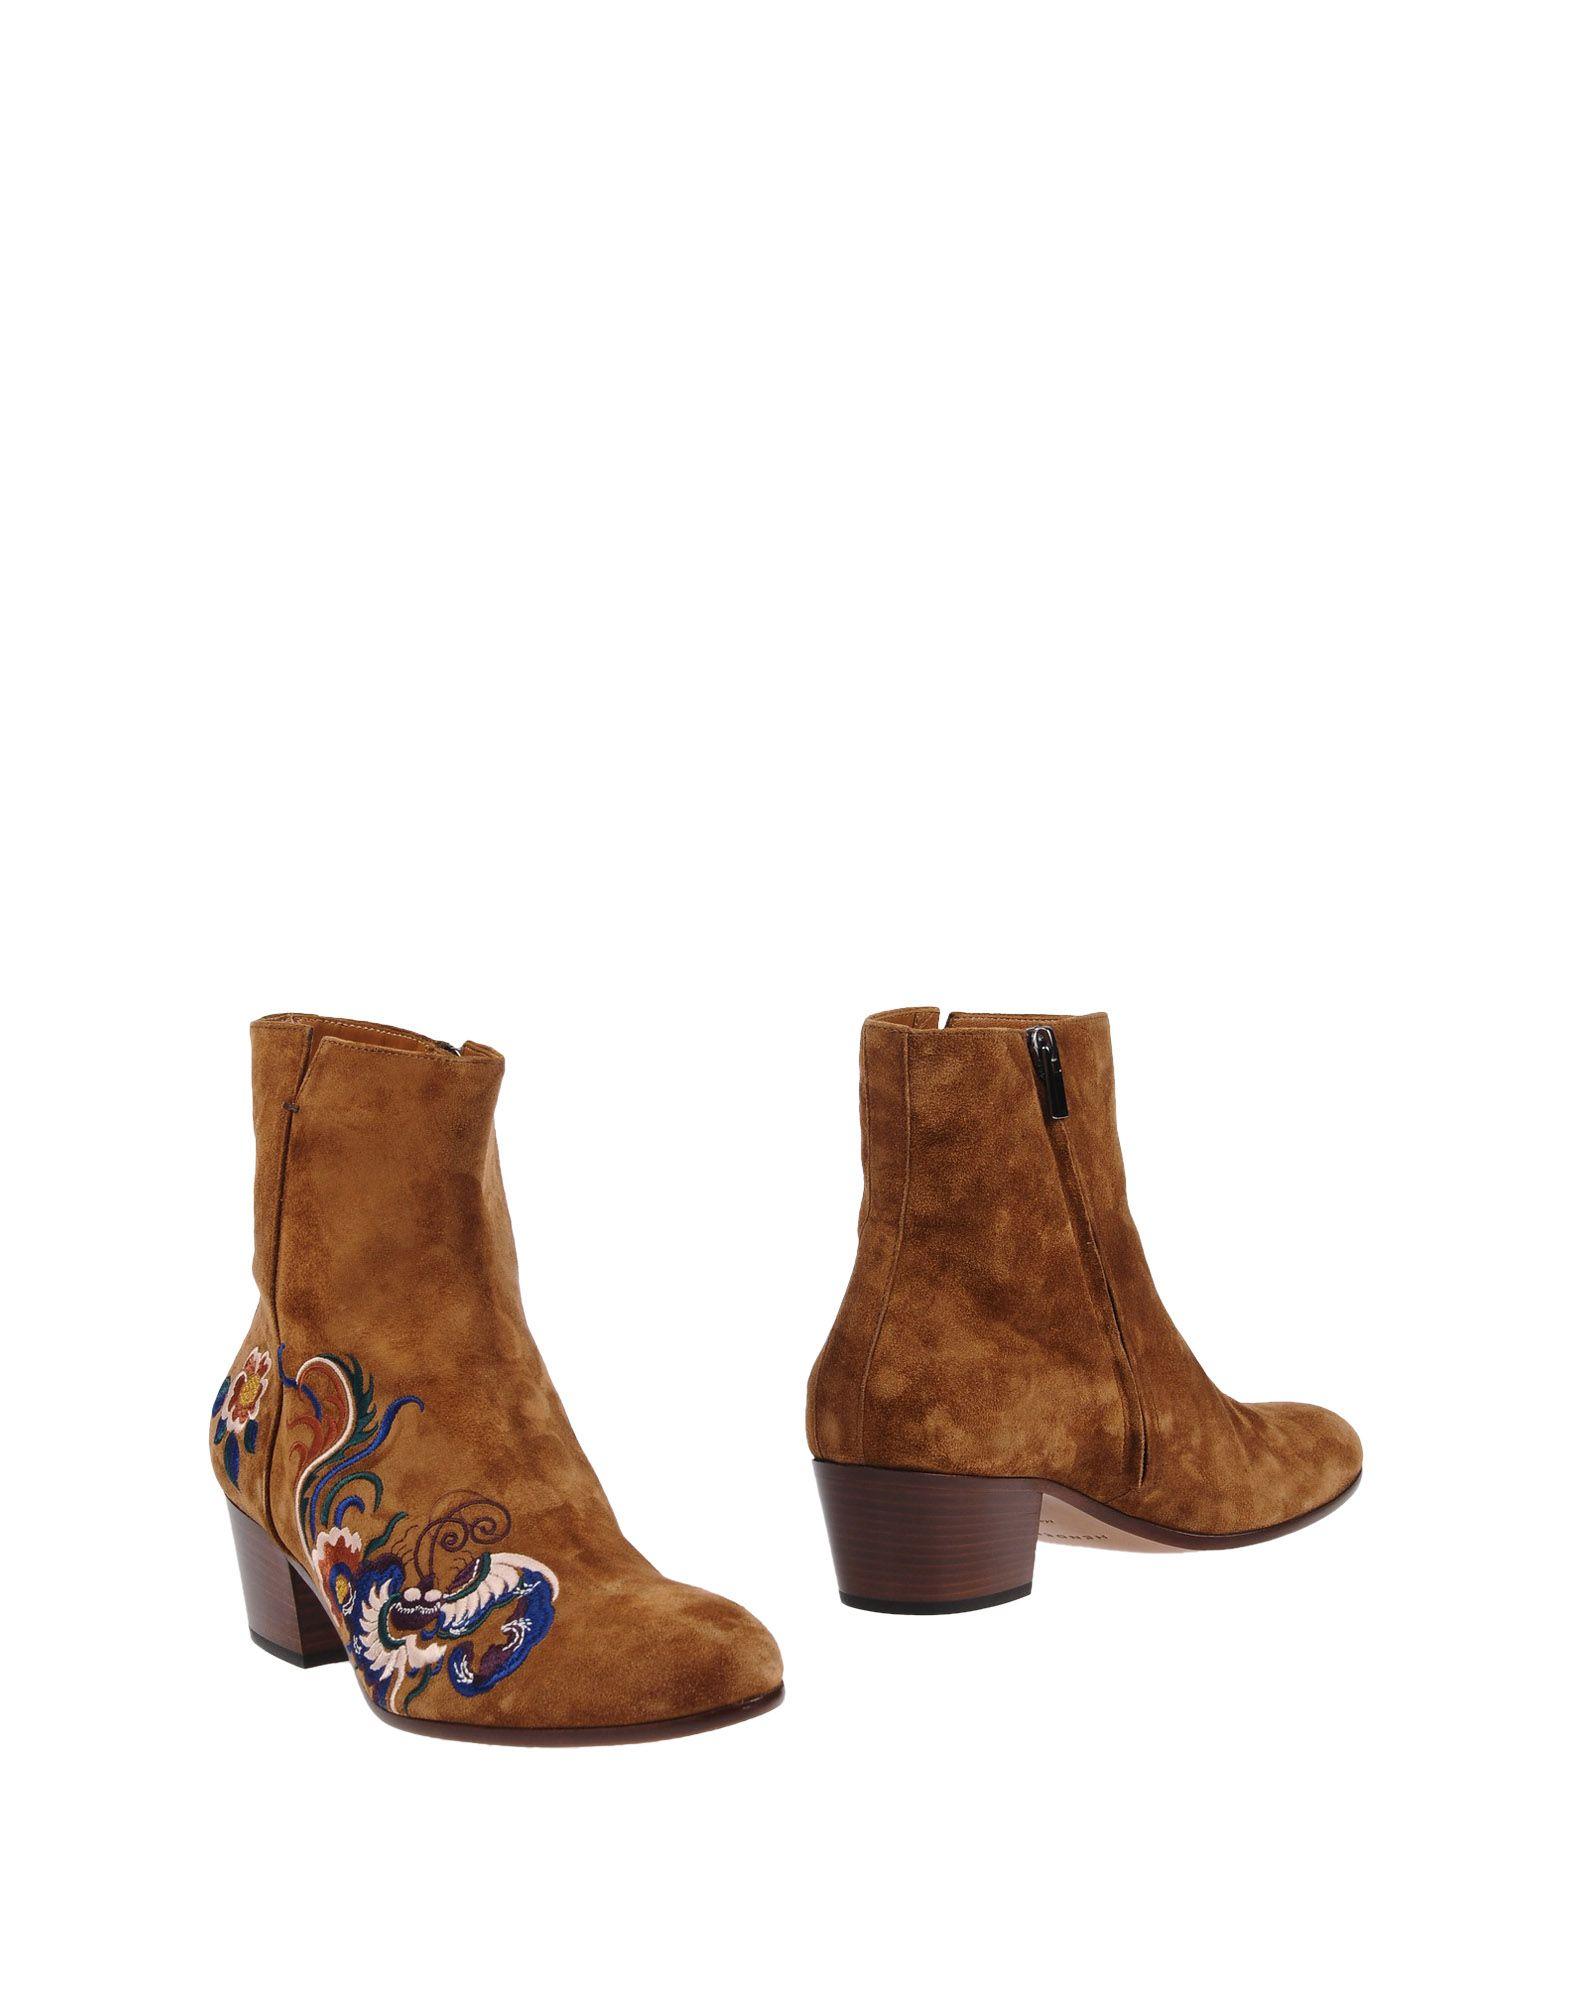 HENDERSON BARACCO Полусапоги и высокие ботинки цены онлайн